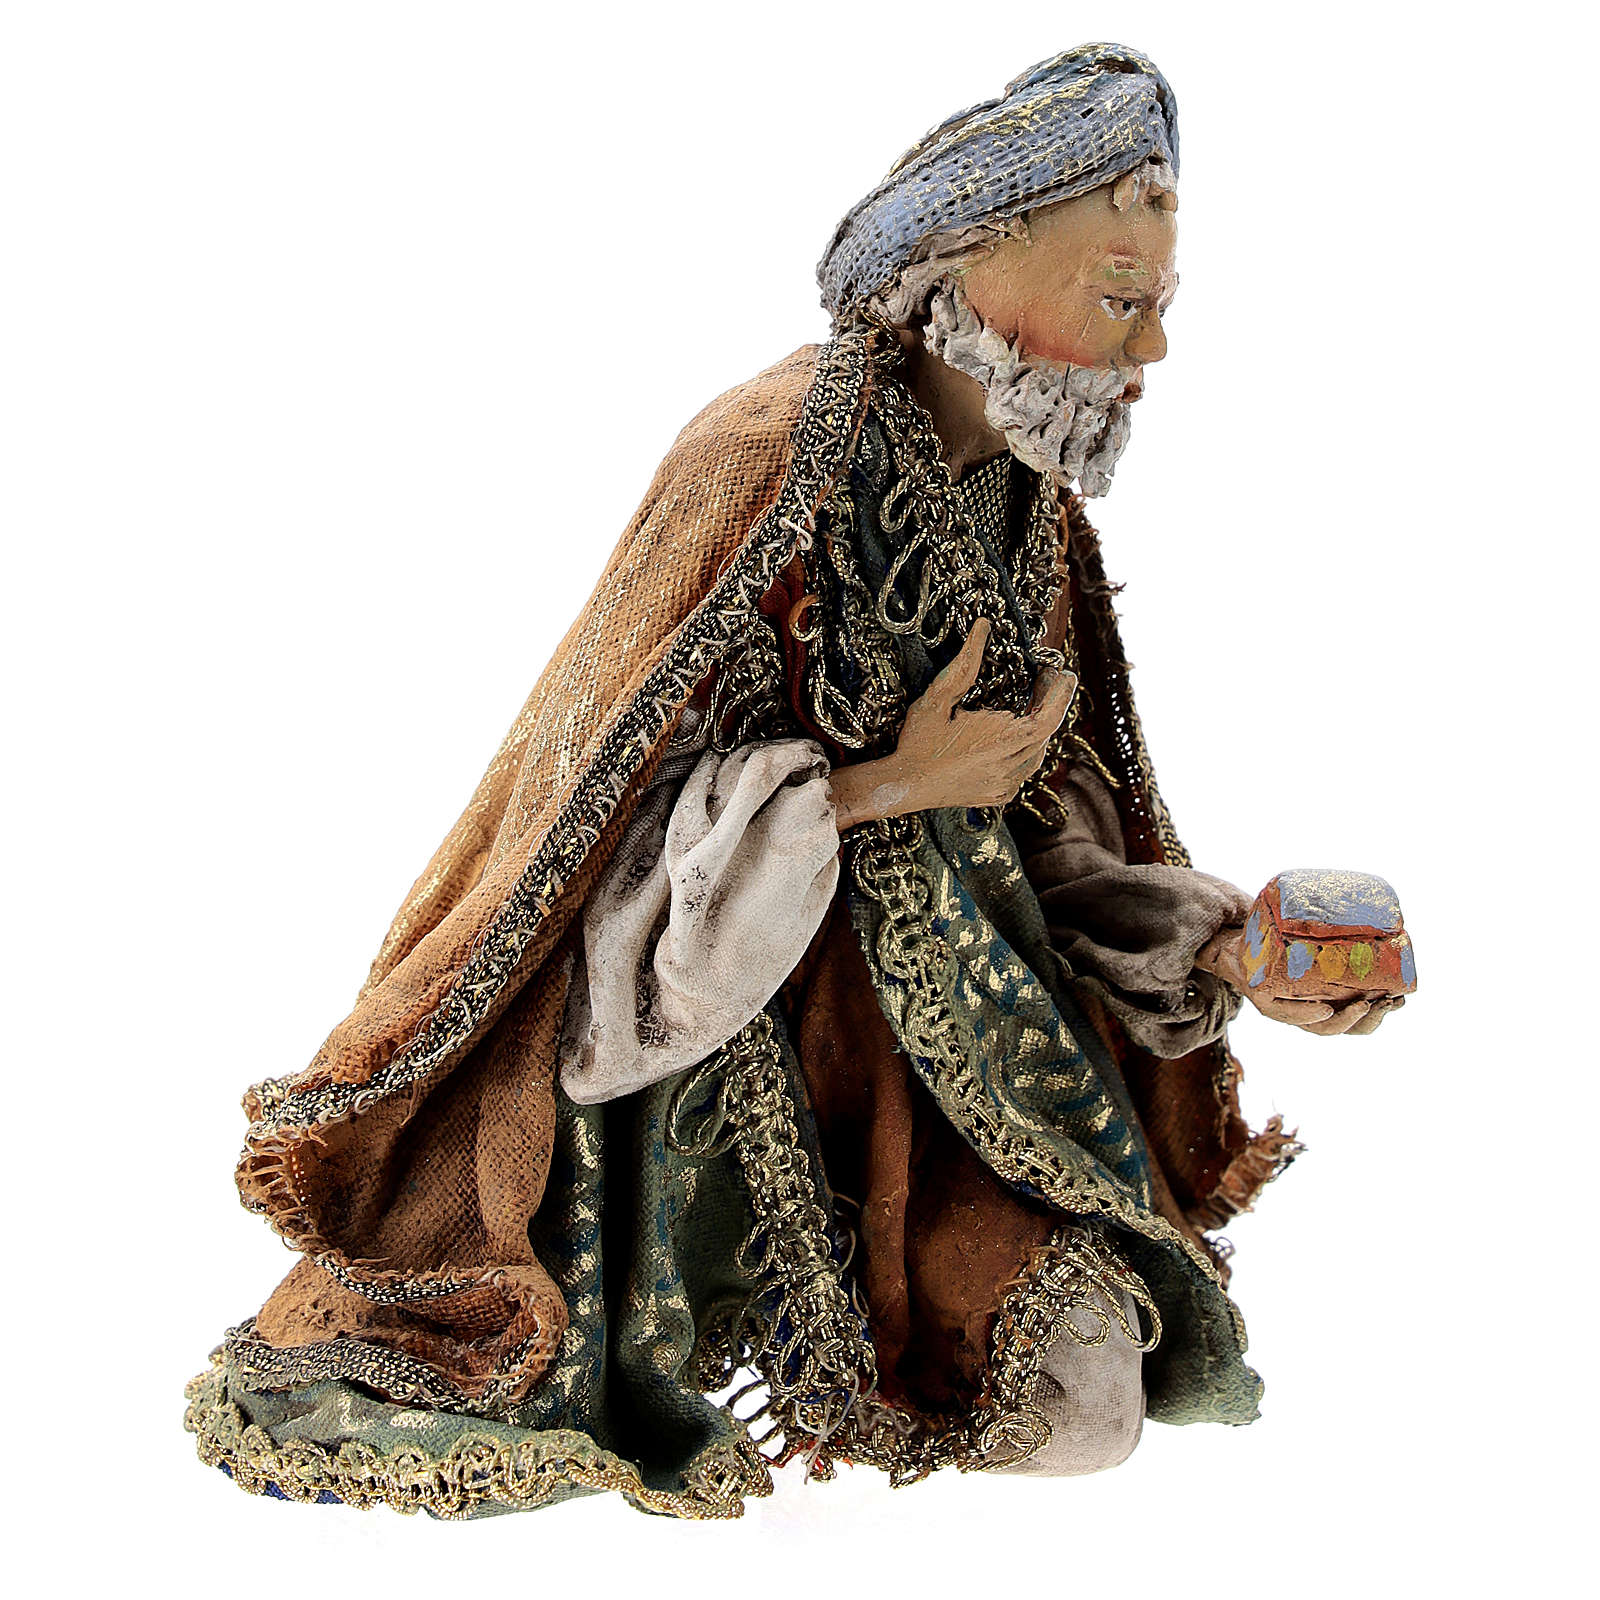 Nativity scene figurine, Kneeling King by Angela Tripi 13 cm 4